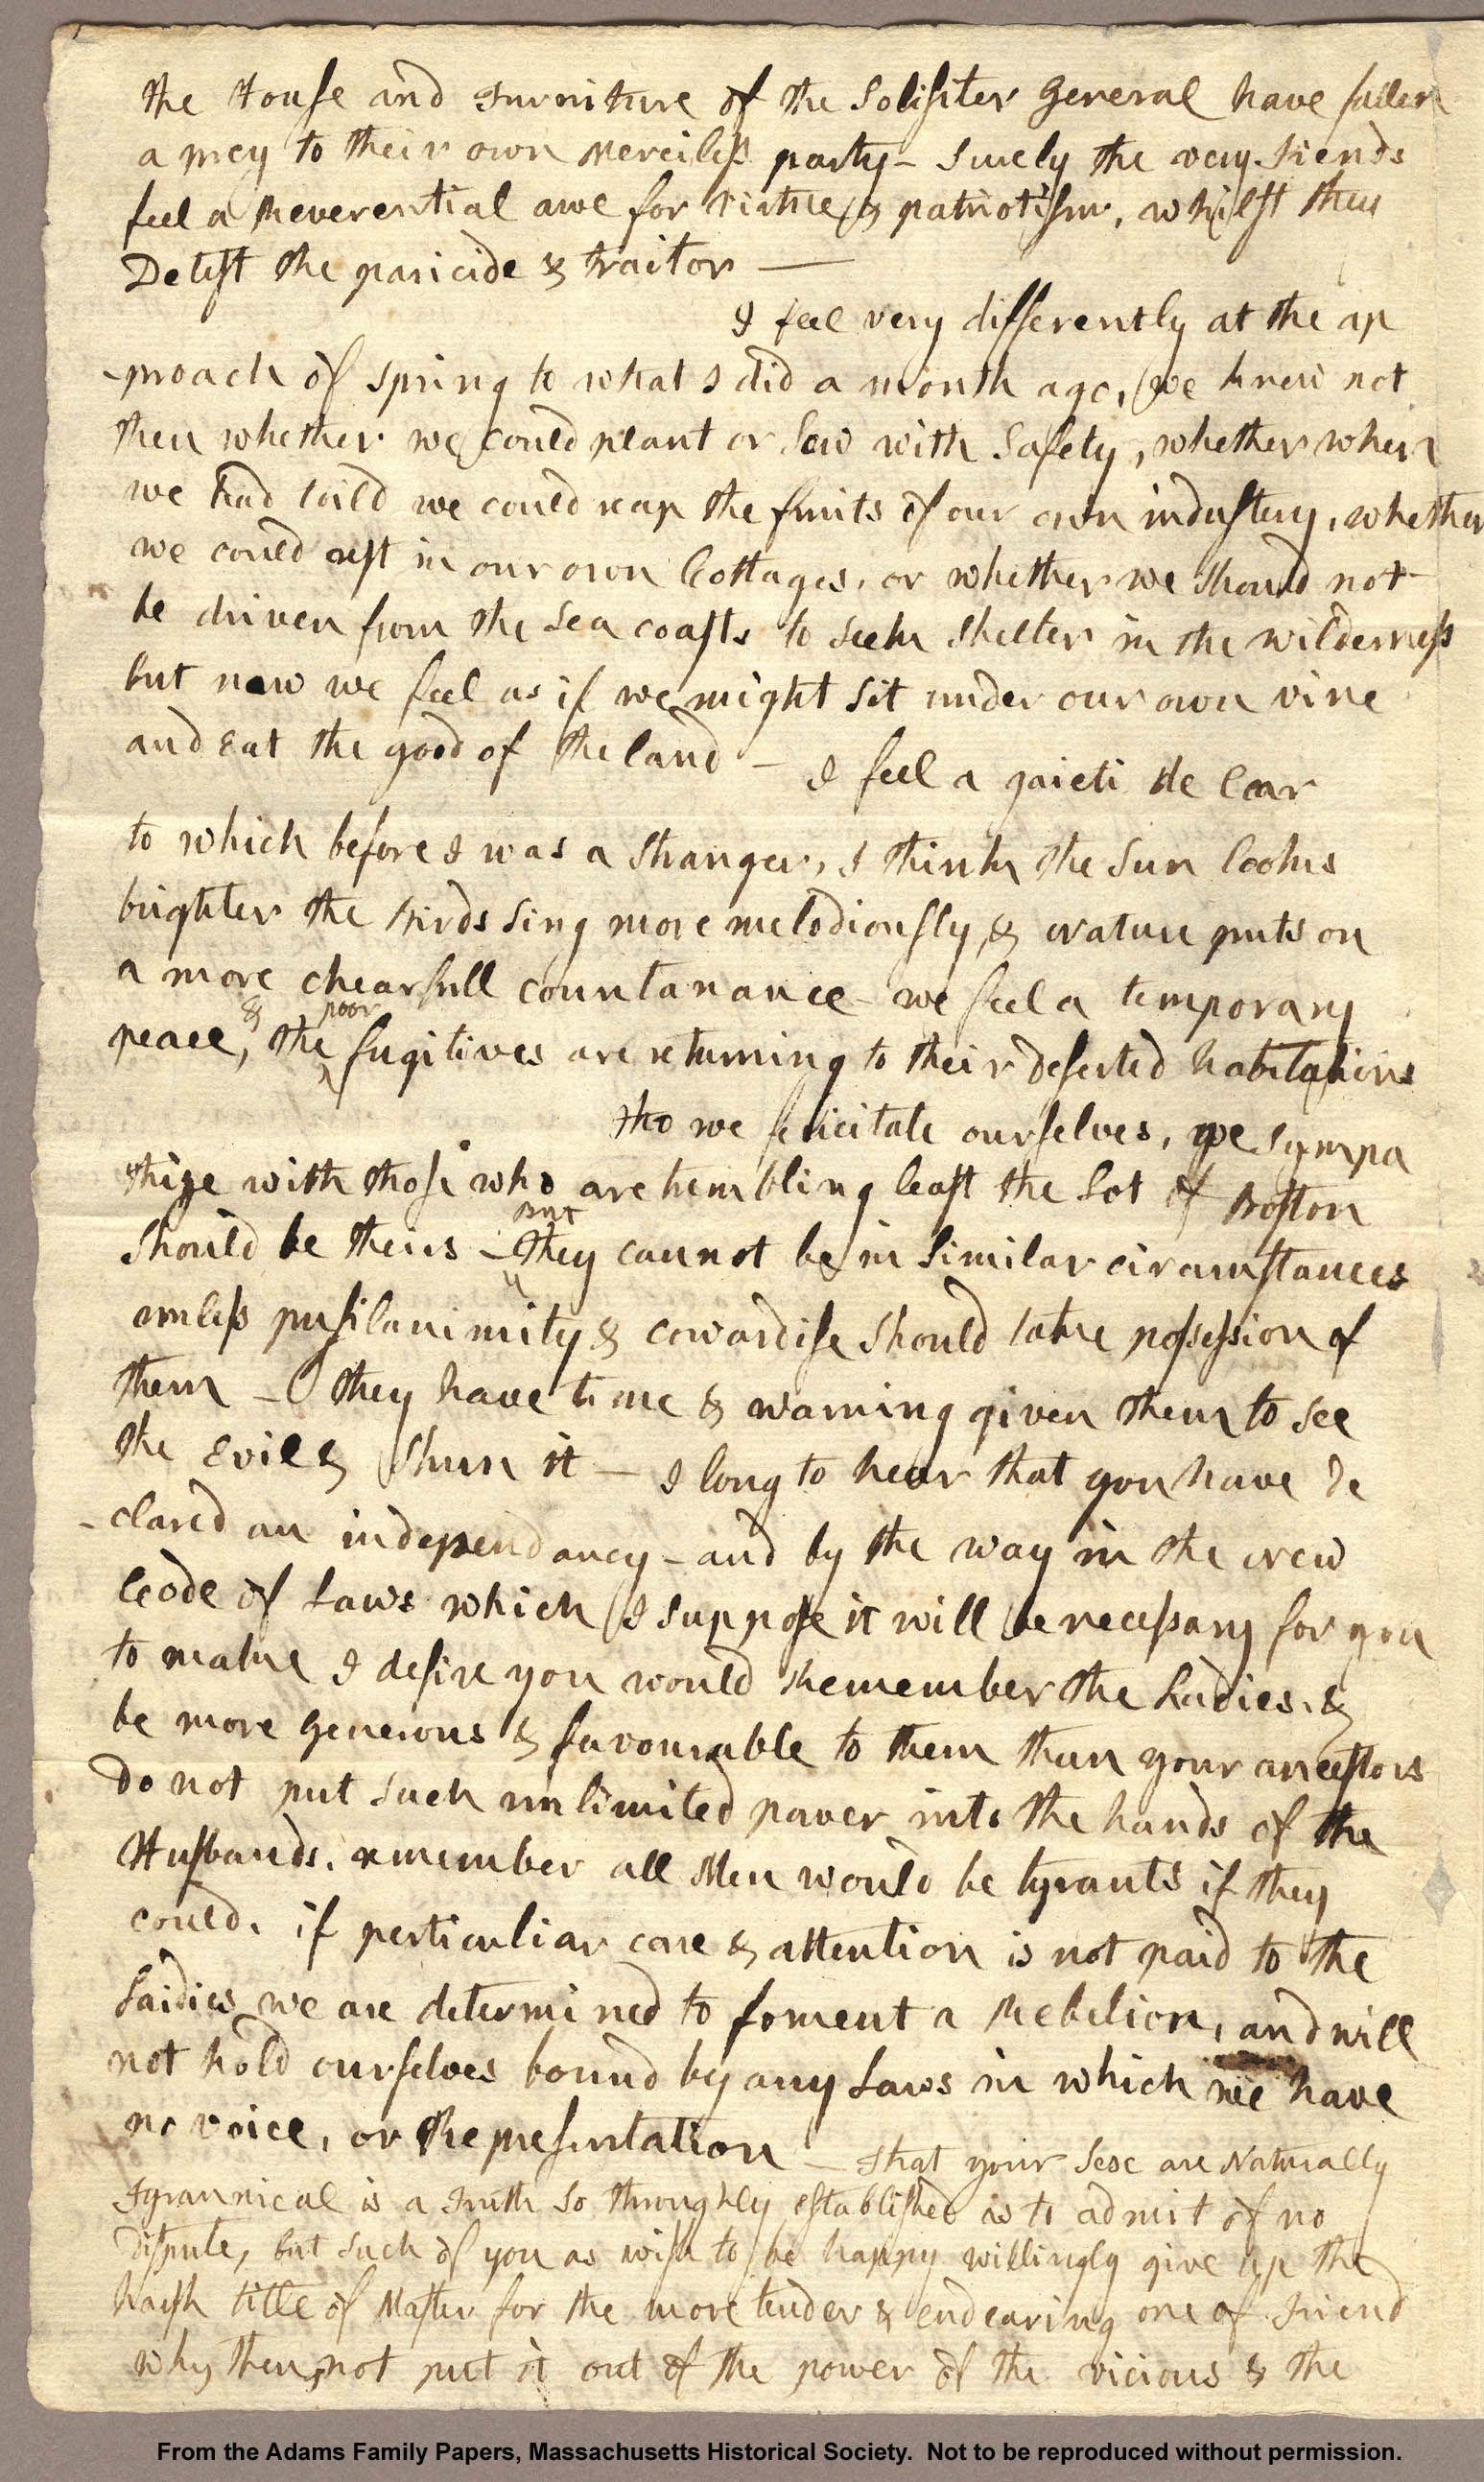 Research Paper On John Adams Bdaccddafa Index?optioncom Contentviewcategoryiditemid